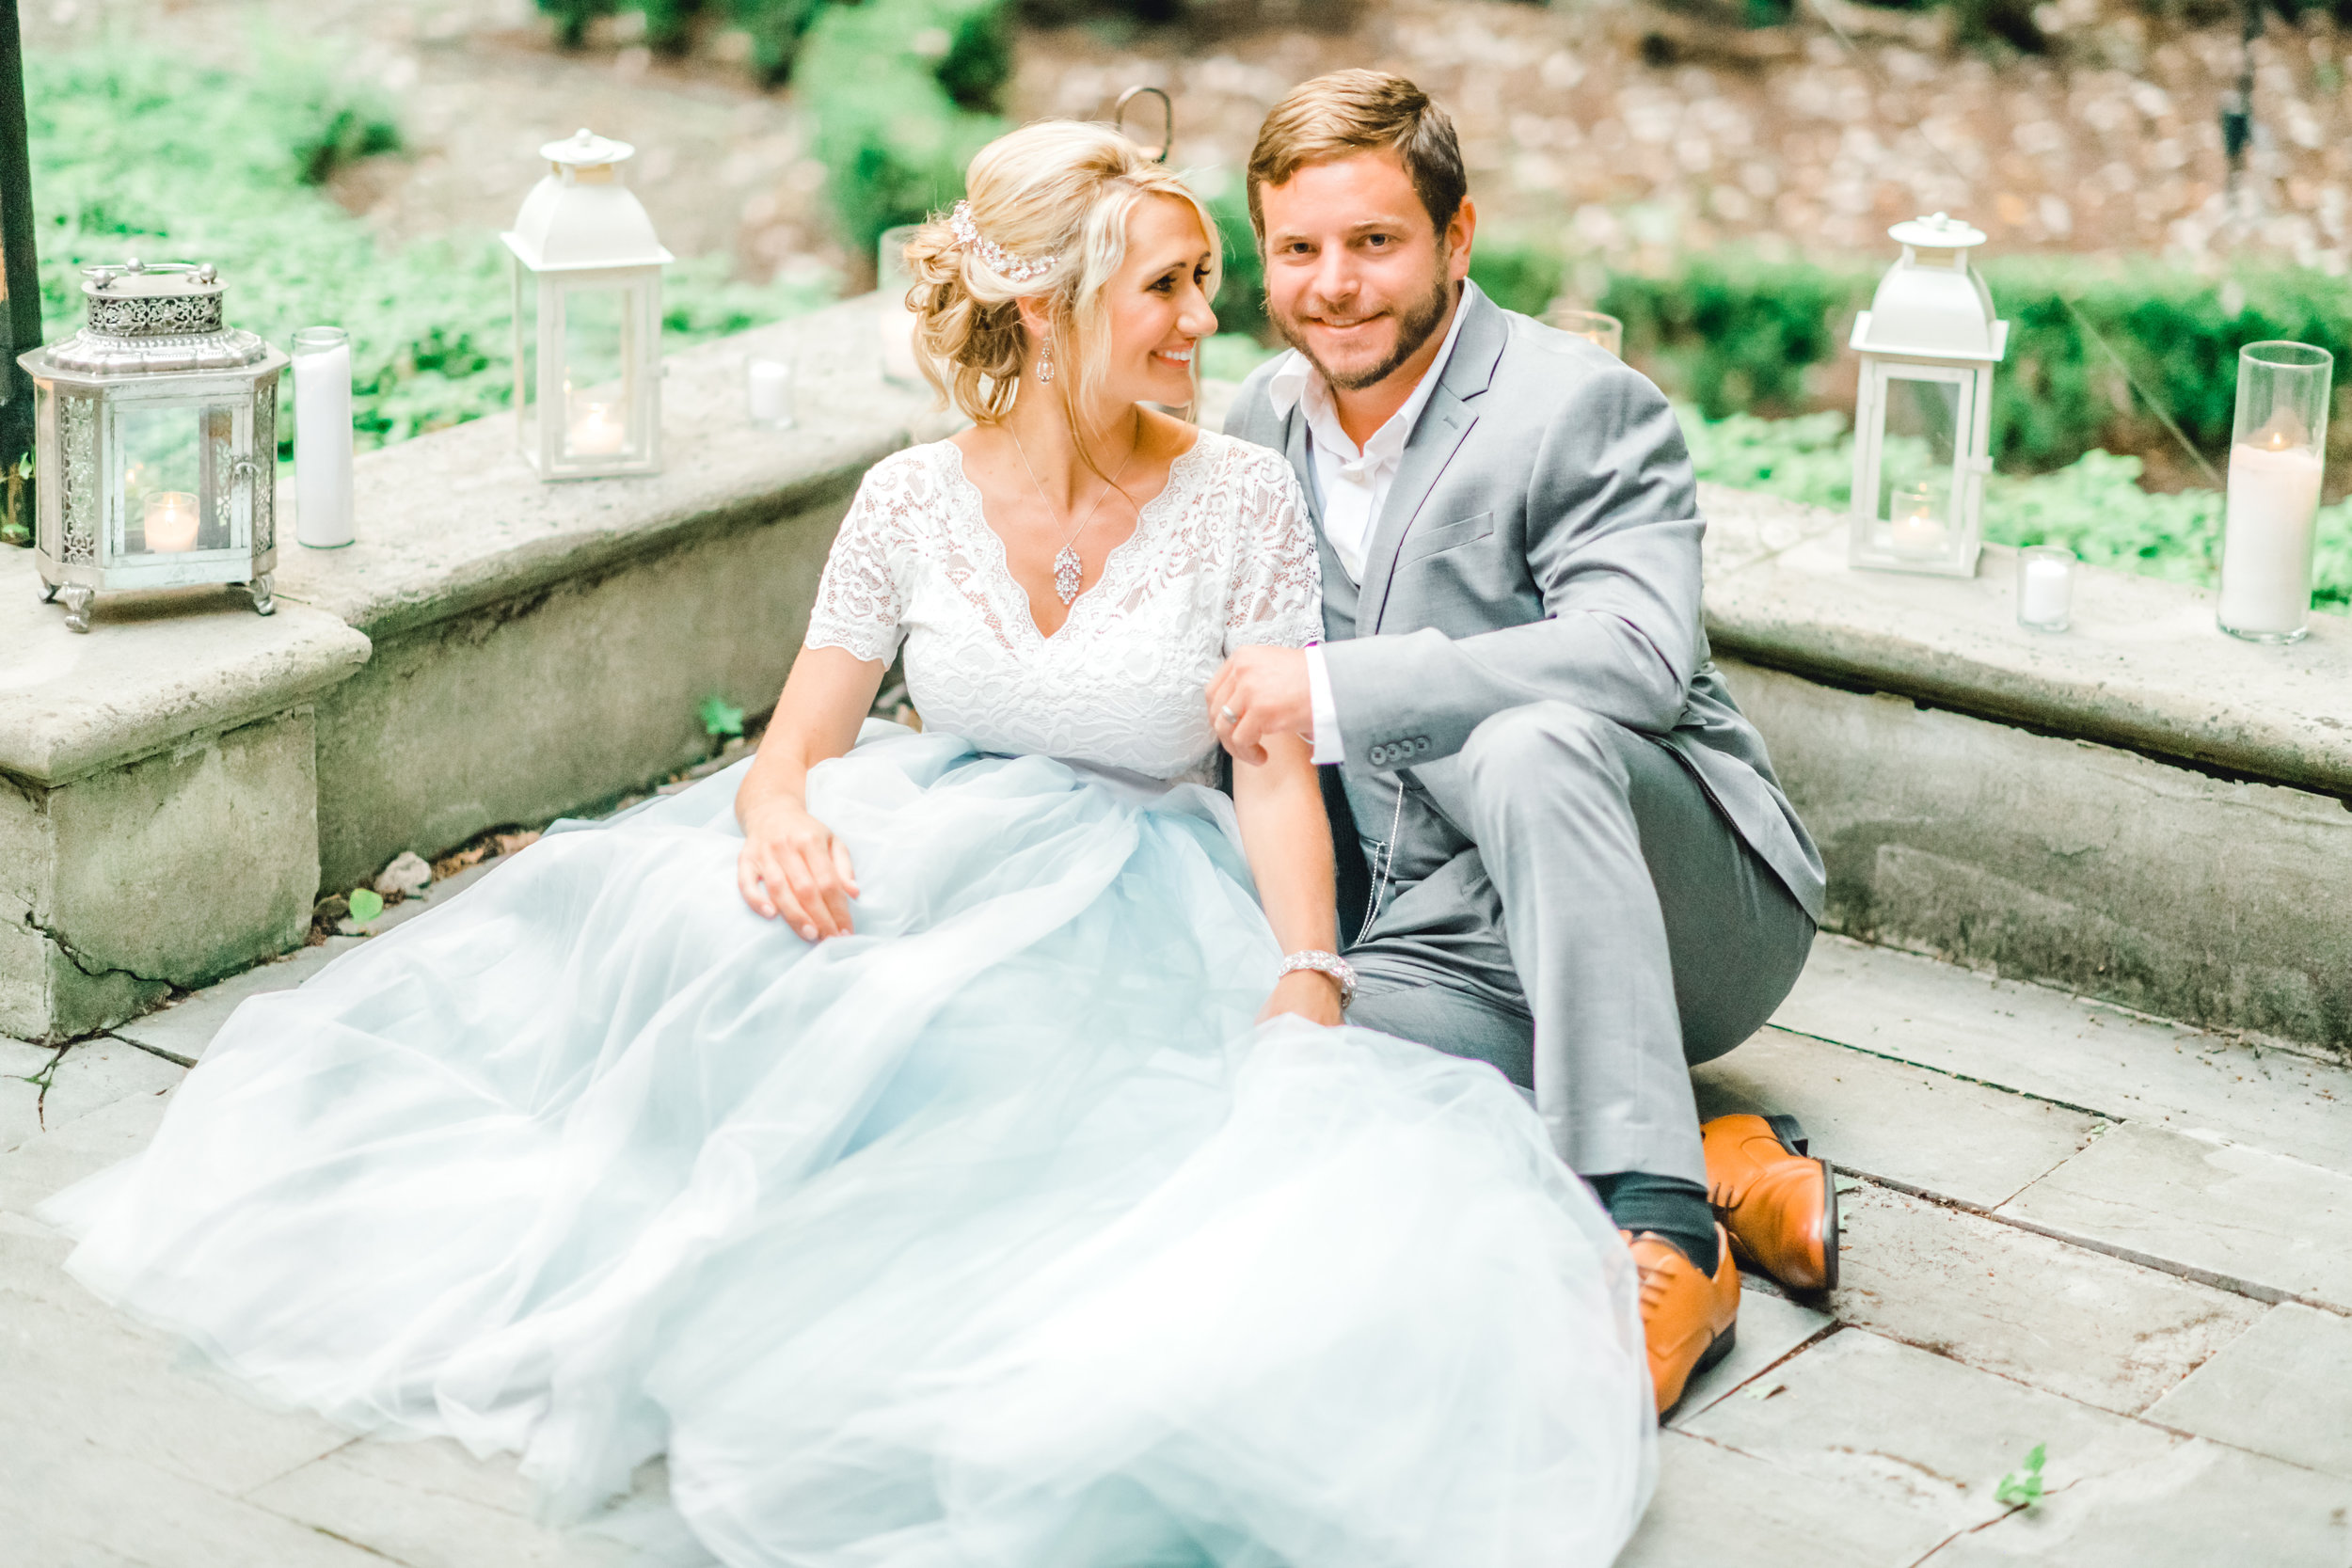 Jessica-Garda-Events-Pittsburgh-Wedding-Planner-Mansion-Butler-Blue-Dress(112).jpg